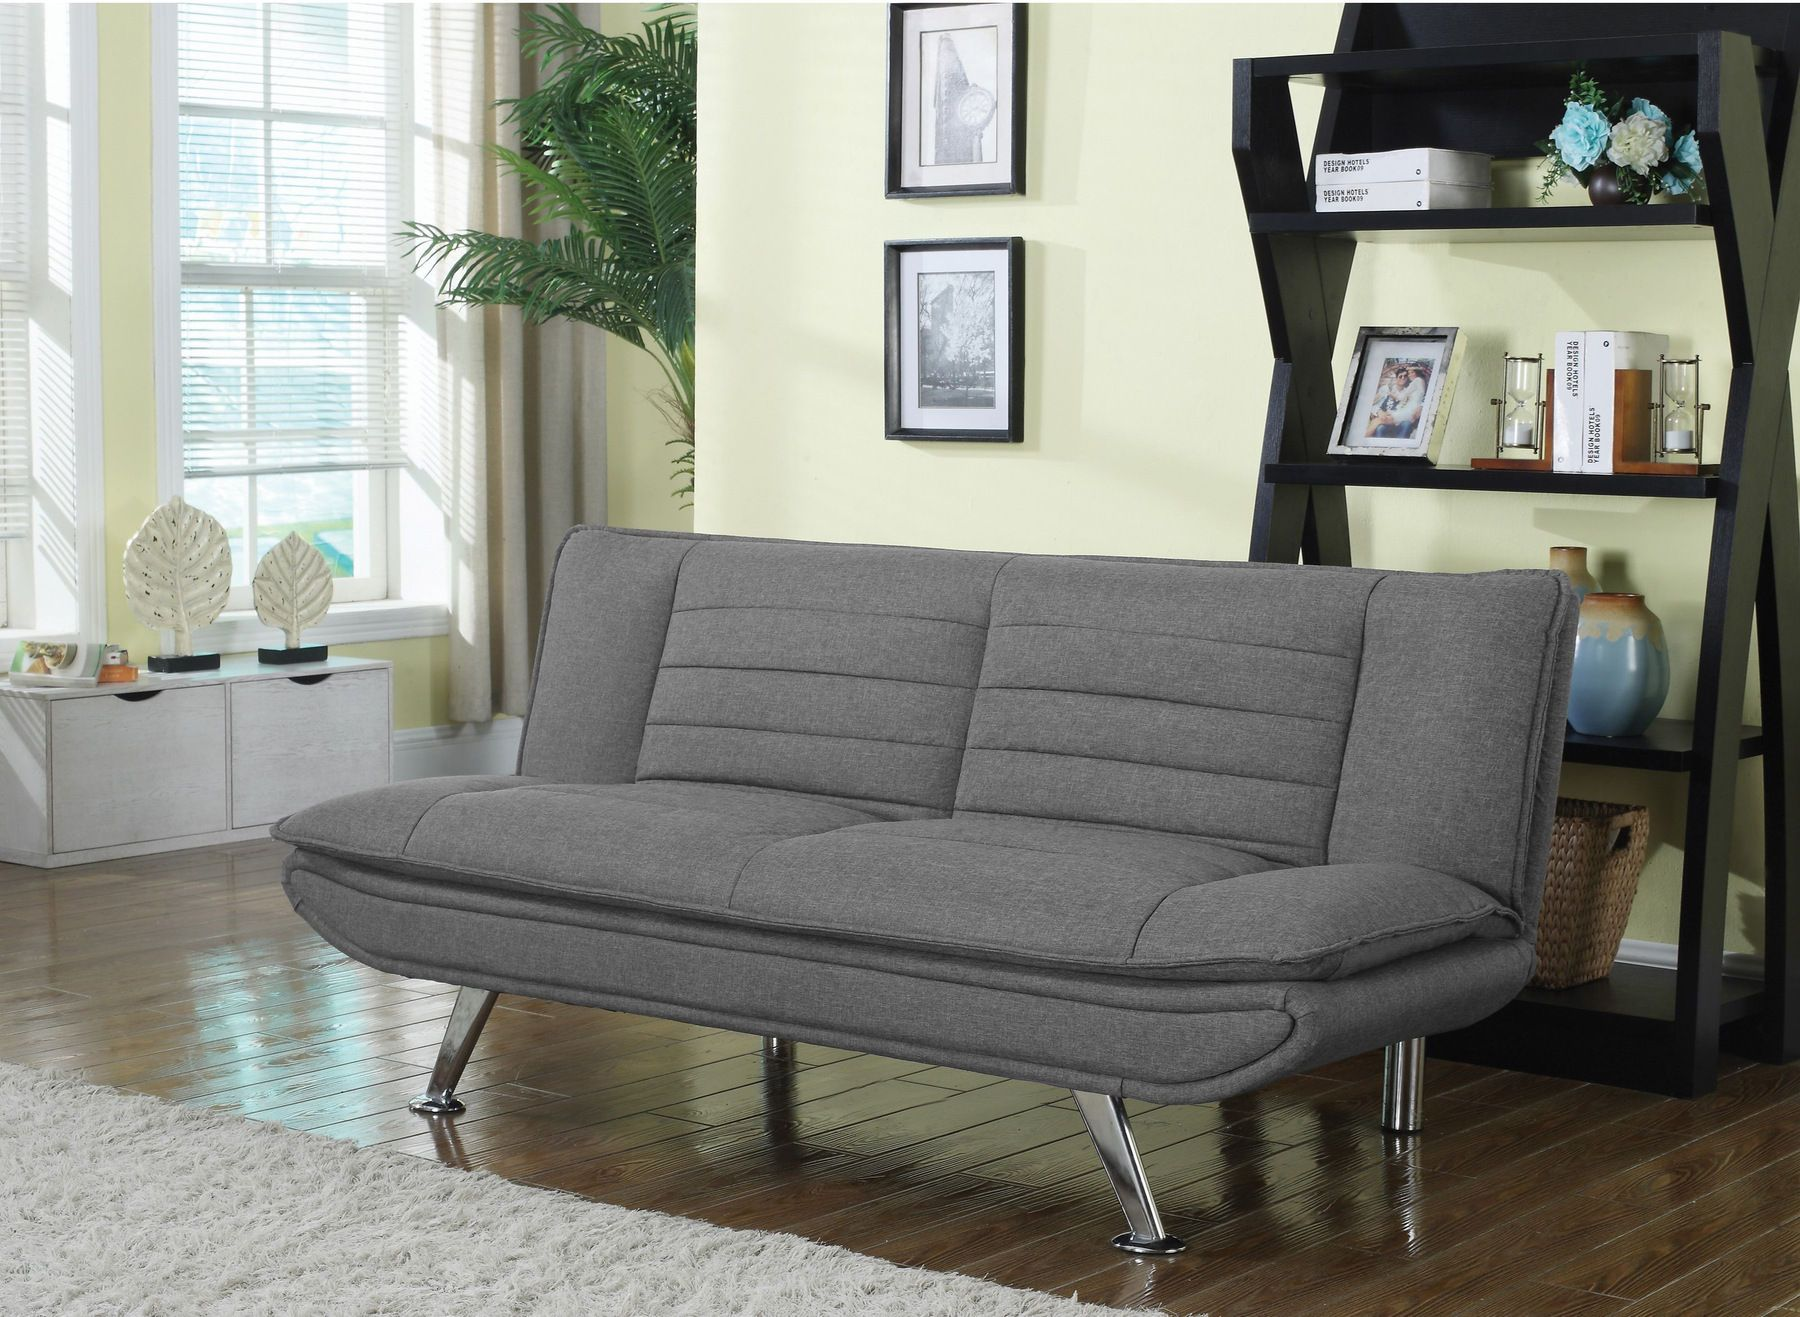 Coaster Cs966 Gray Woven Fabric Sofa Bed Grey Sofa Bed Living